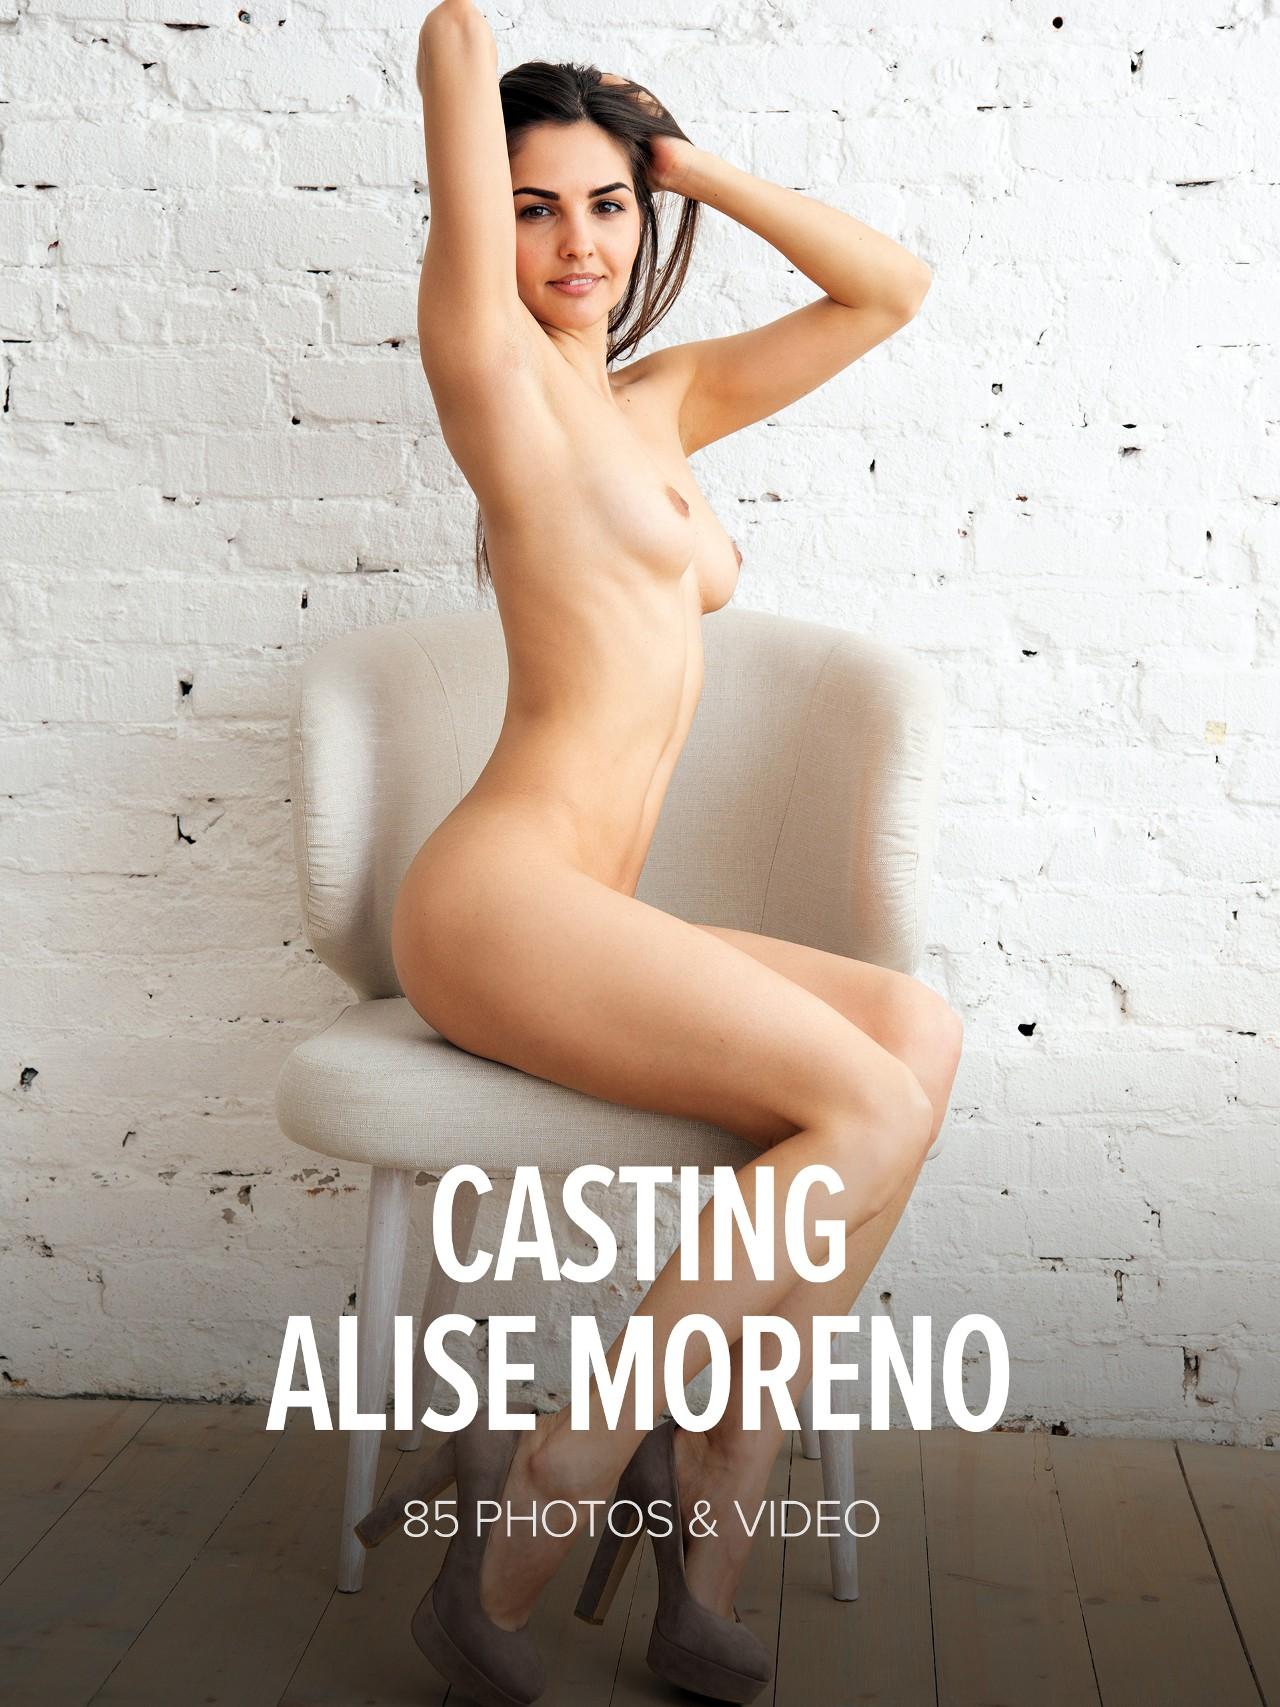 Alise Moreno: CASTING Alise Moreno